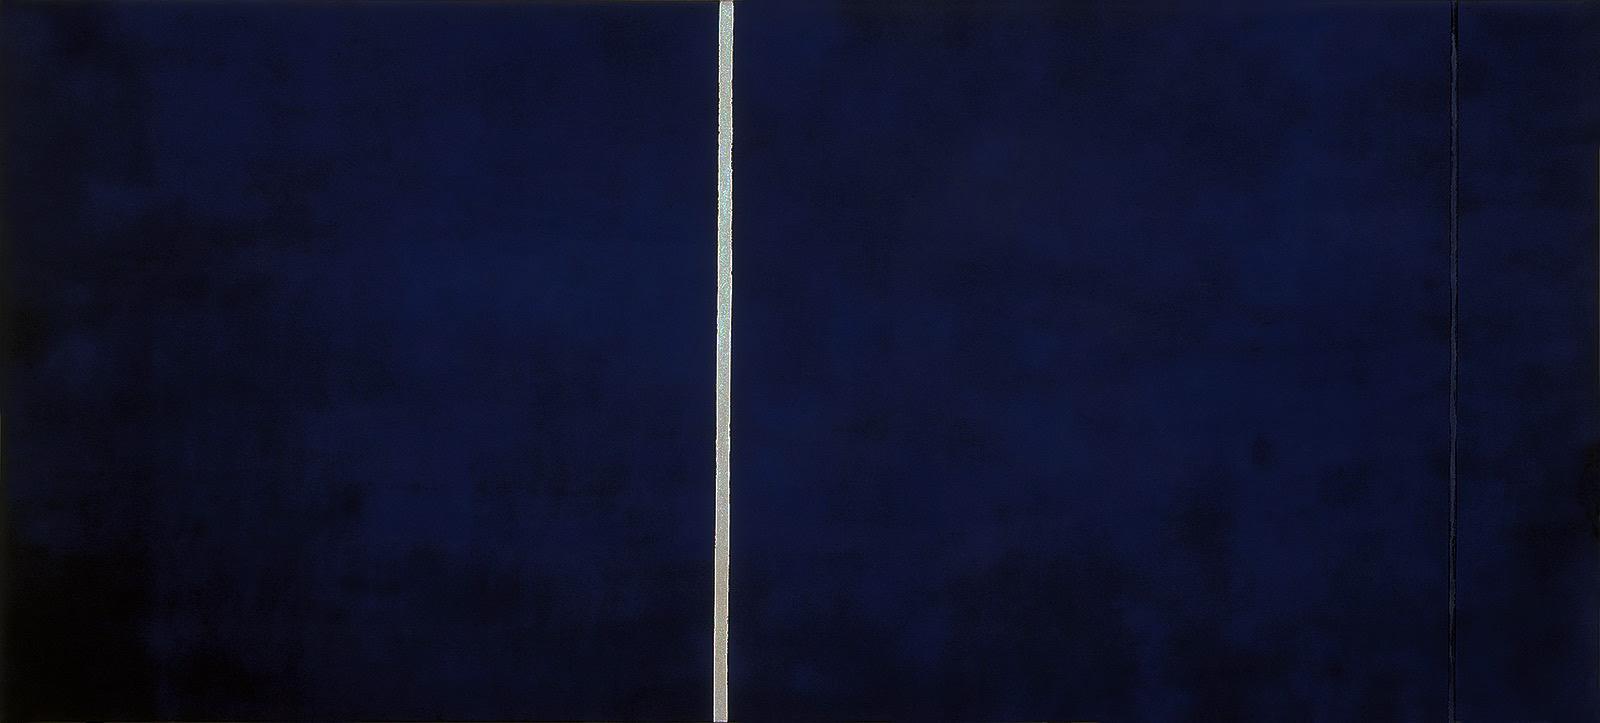 barnett-newman-cathedra-magna-1951